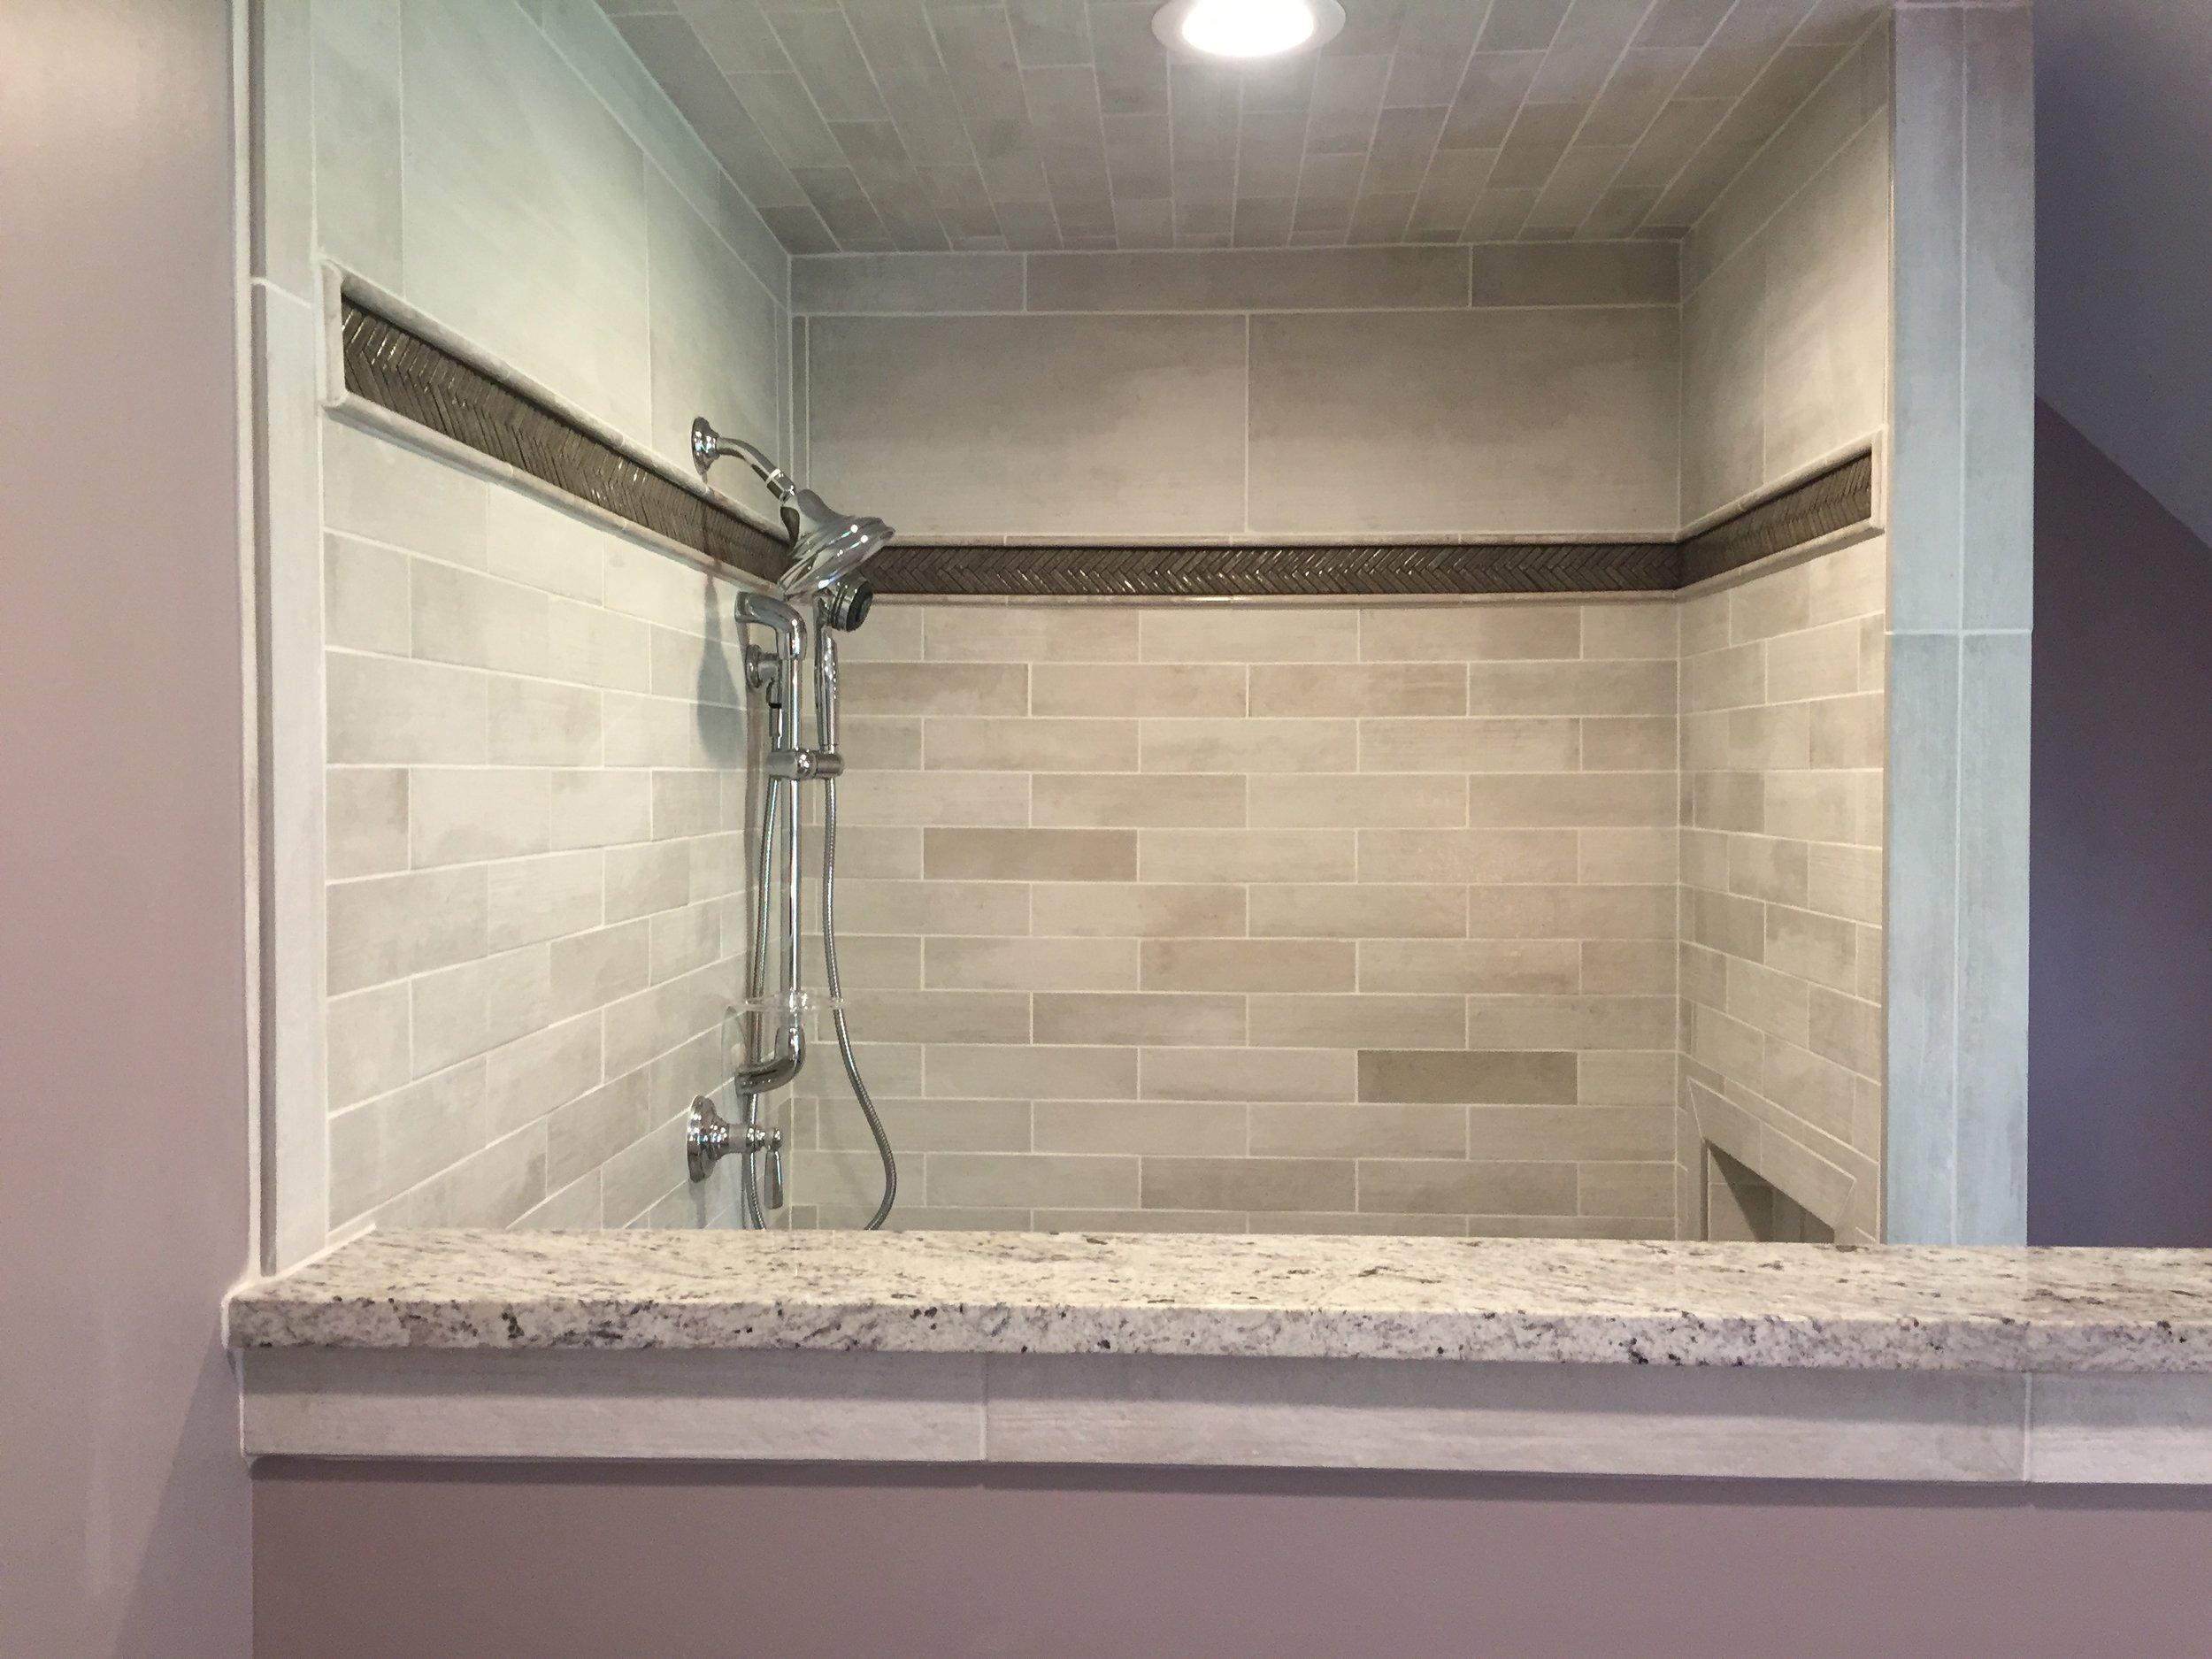 terri feralio - finished bathroom (5).JPG